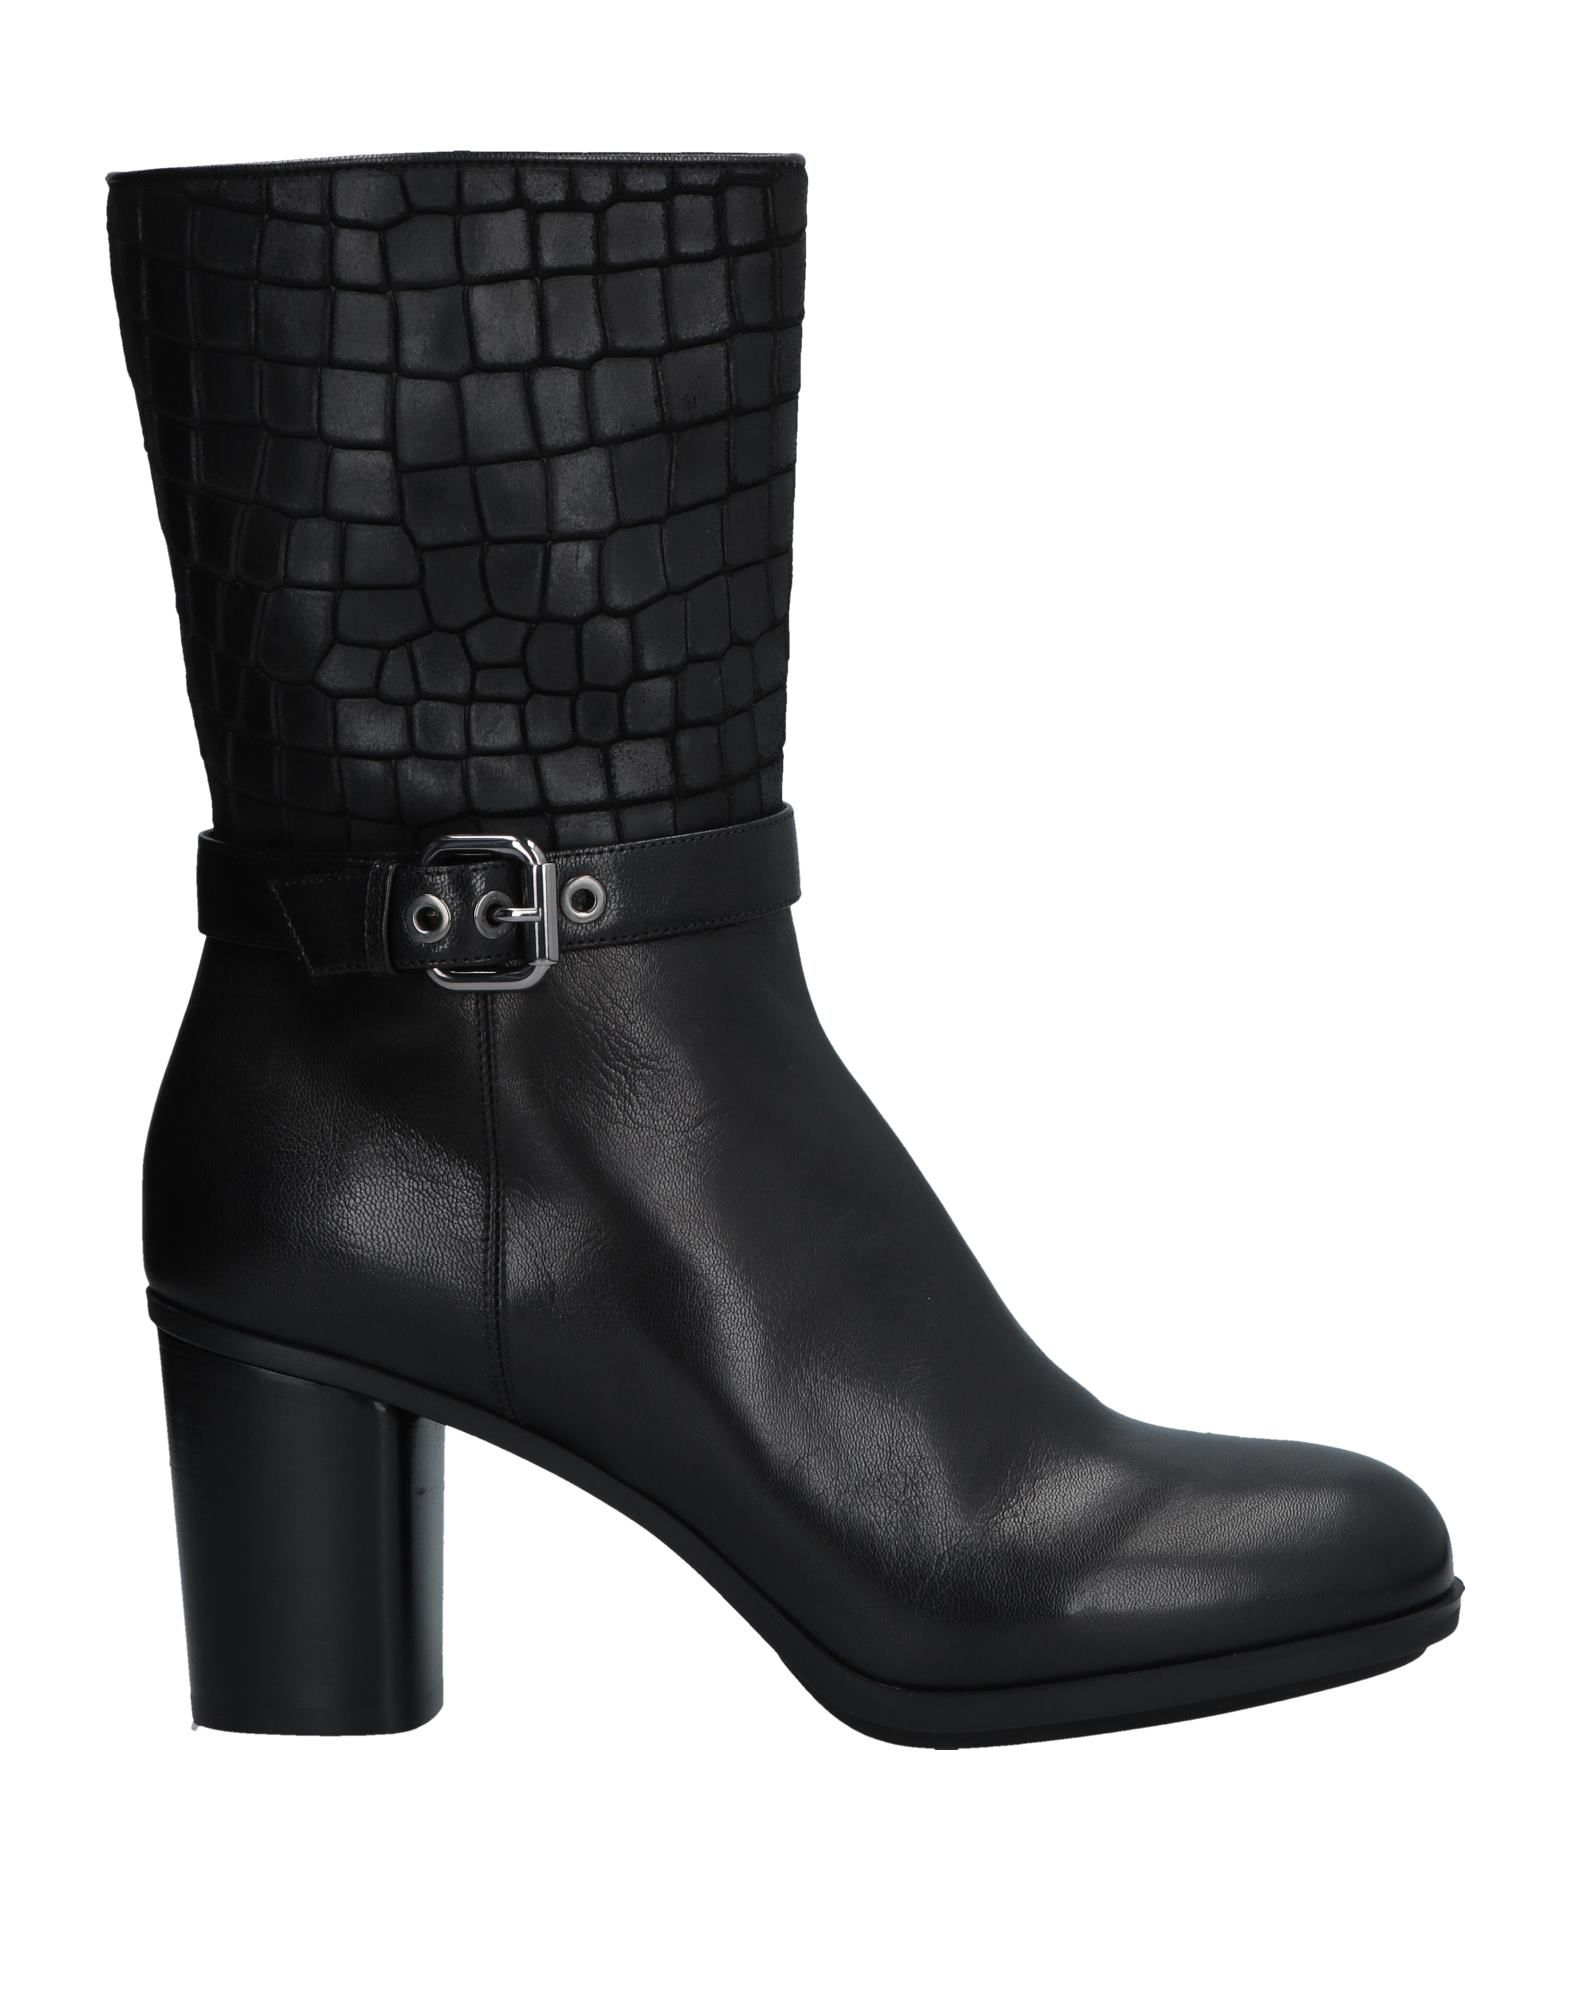 Loriblu Ankle Ankle Loriblu Boot - Women Loriblu Ankle Boots online on  Australia - 11560431XK 8971b5